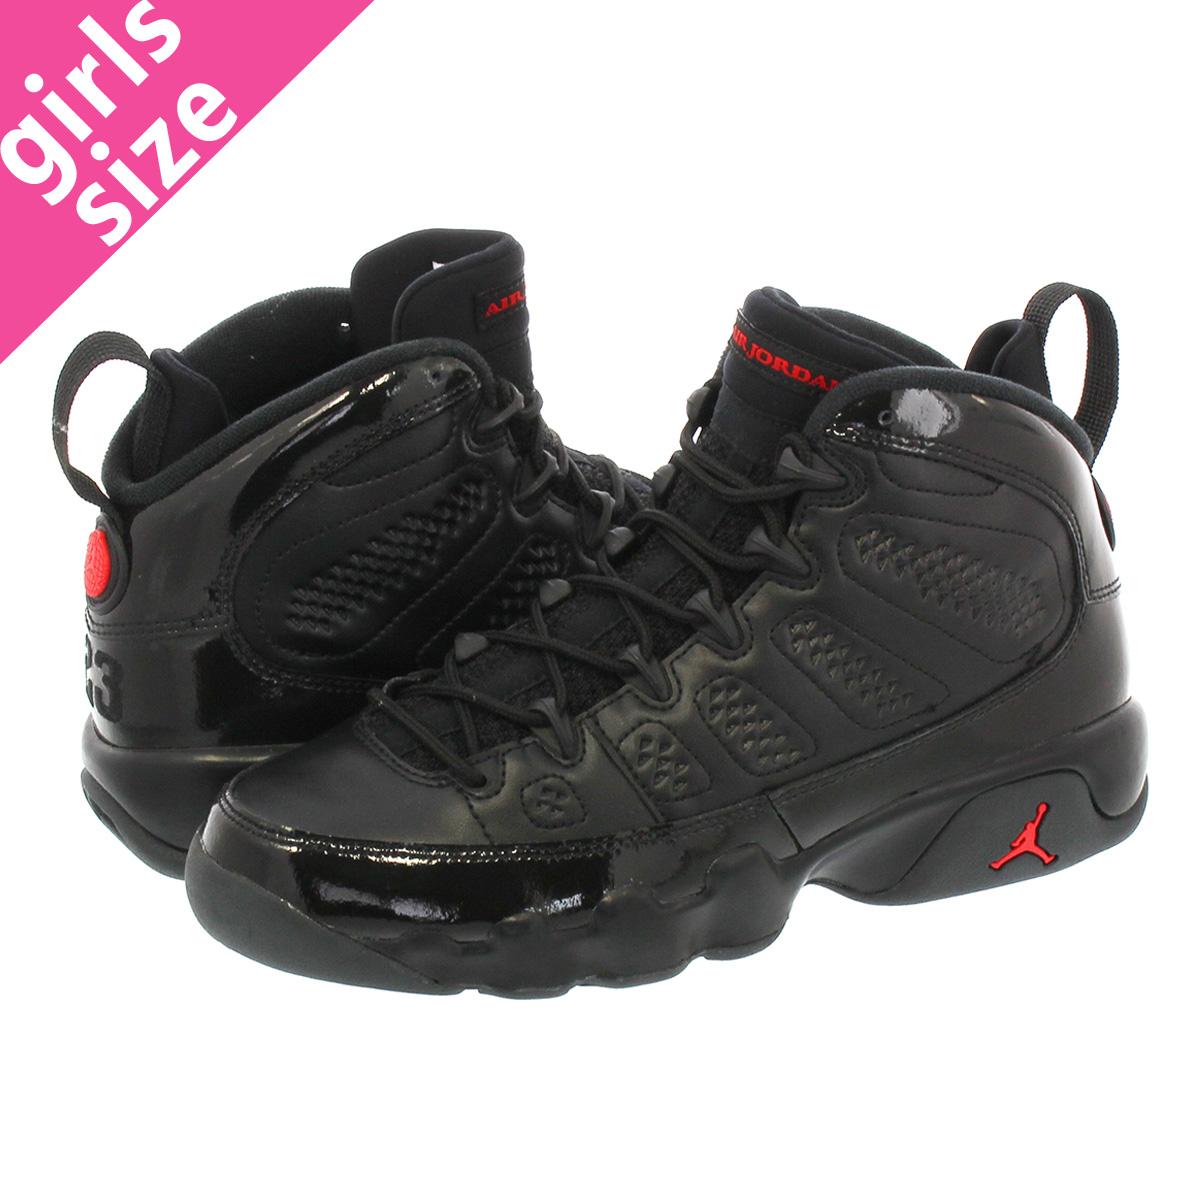 quality design b34be de266 NIKE AIR JORDAN 9 RETRO BG Nike Air Jordan 9 nostalgic BG BLACK/UNIVERSITY  RED 302,359-014